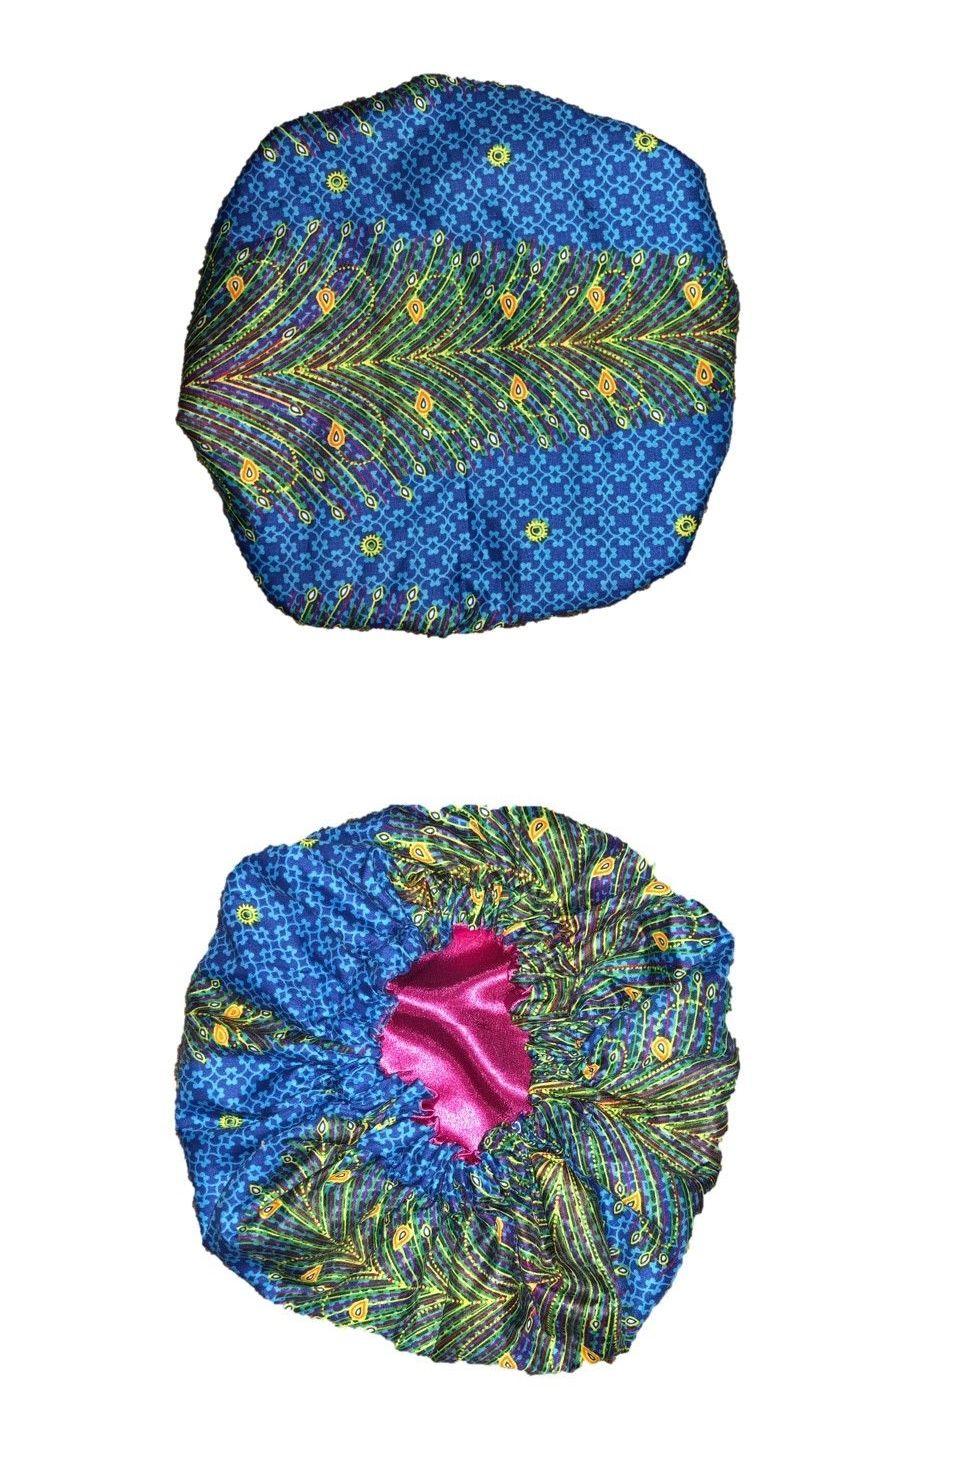 b08274302db Africa 155241  Ankara African Print Satin Sleep Bonnet -  BUY IT NOW ONLY